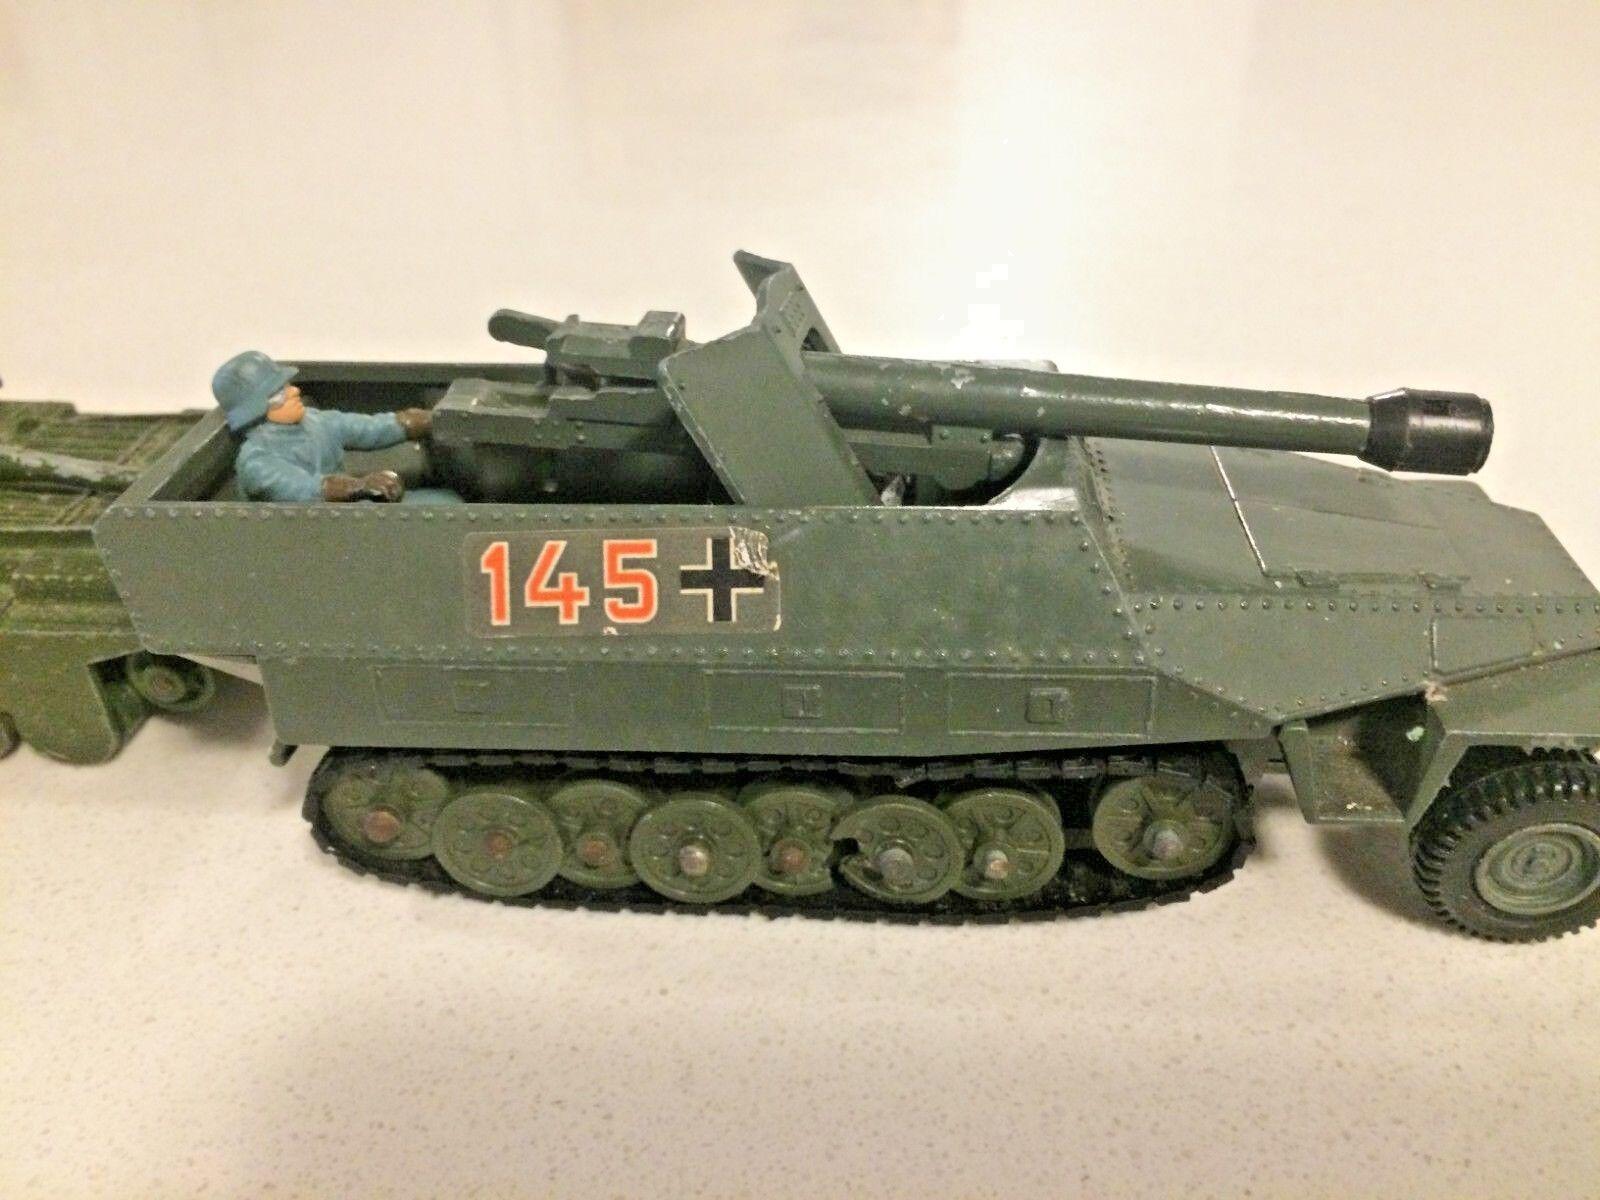 Dinky Ejército Ejército Ejército Juguetes dos fotos 790b38